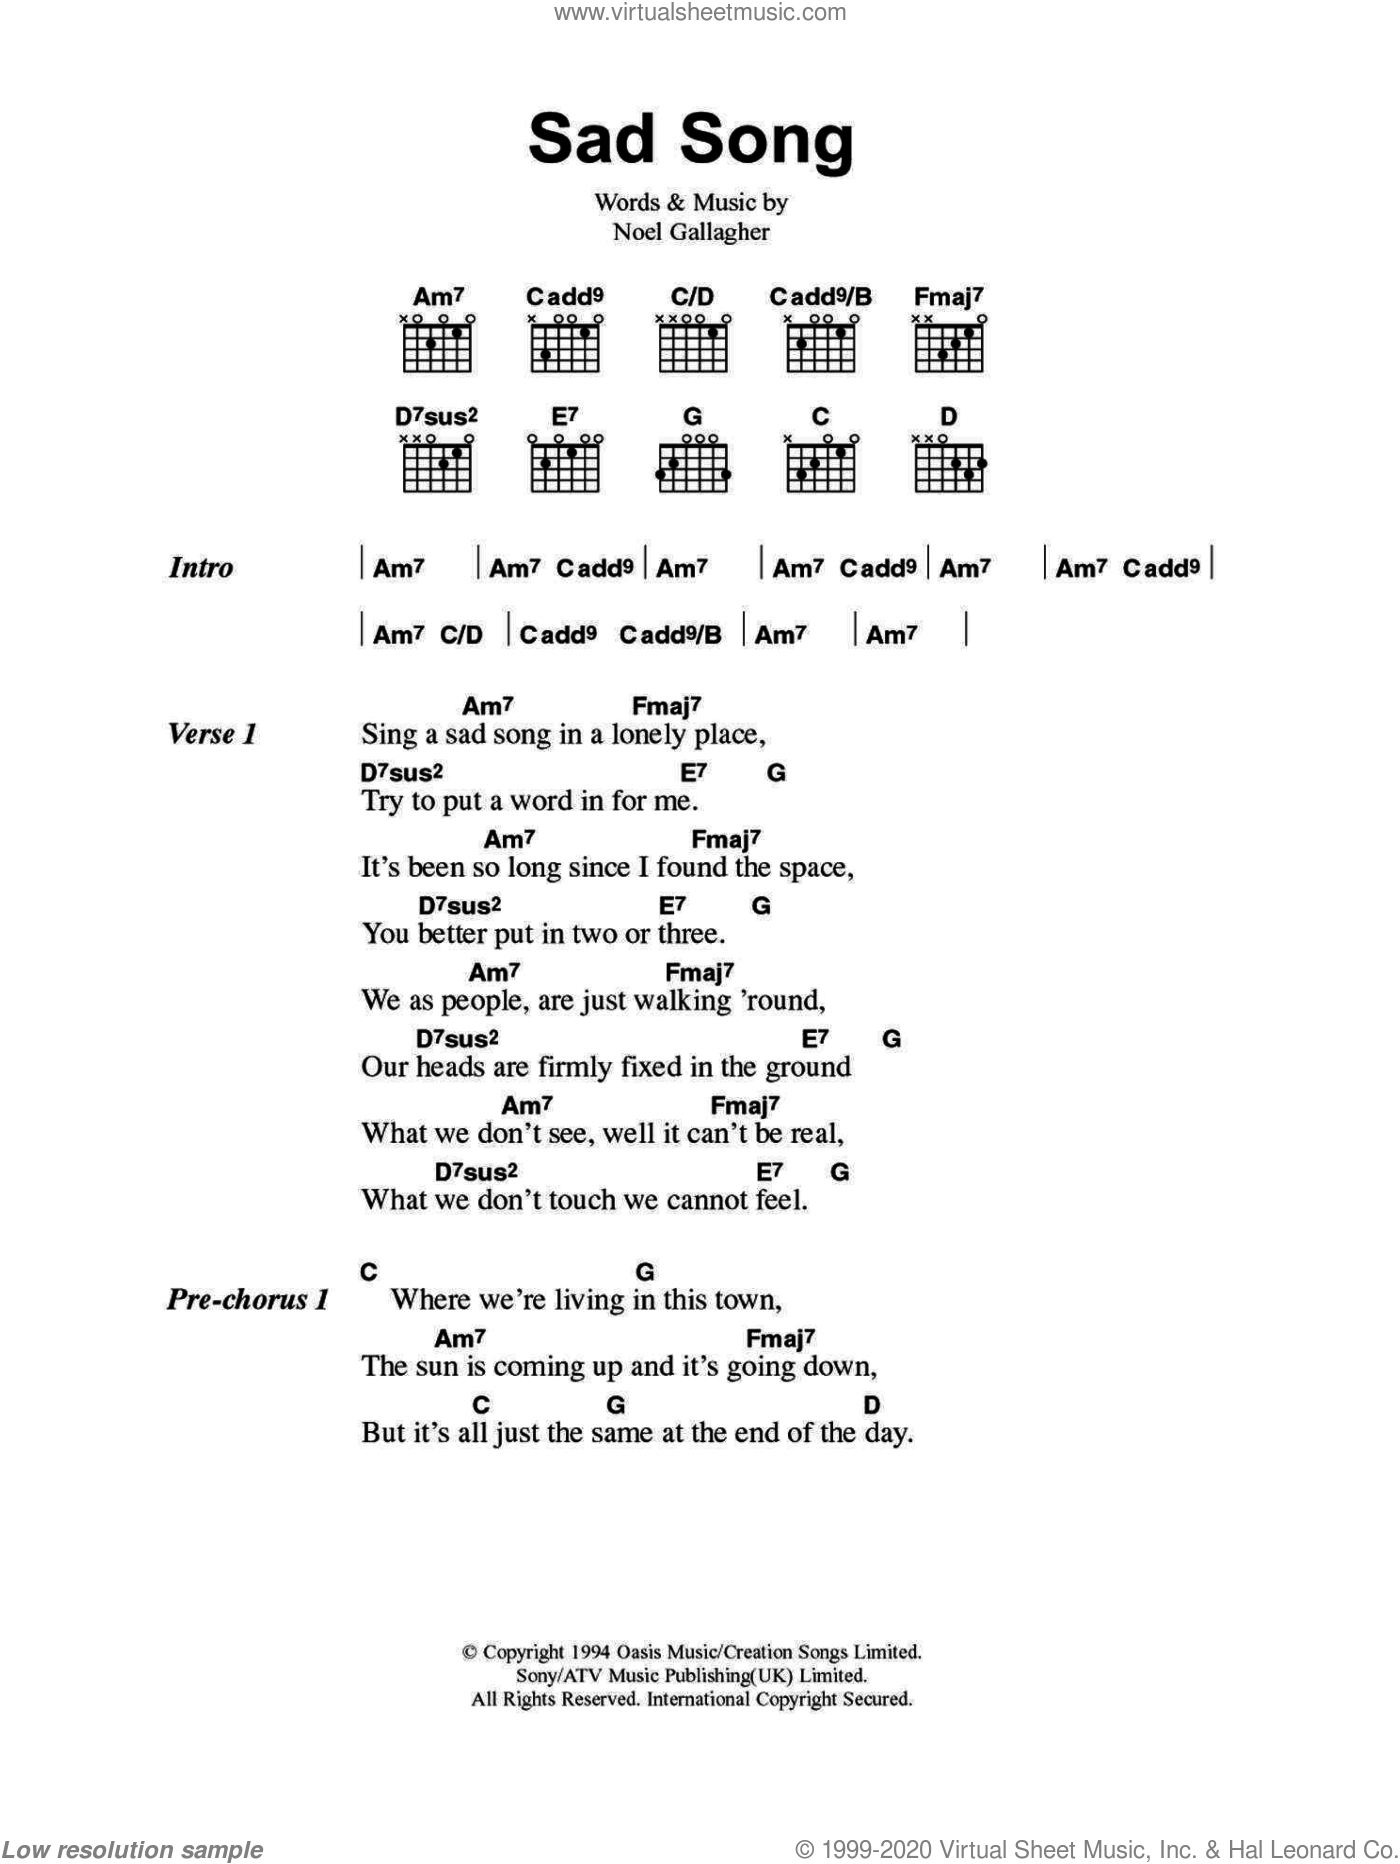 Oasis - Sad Song sheet music for guitar (chords) [PDF]